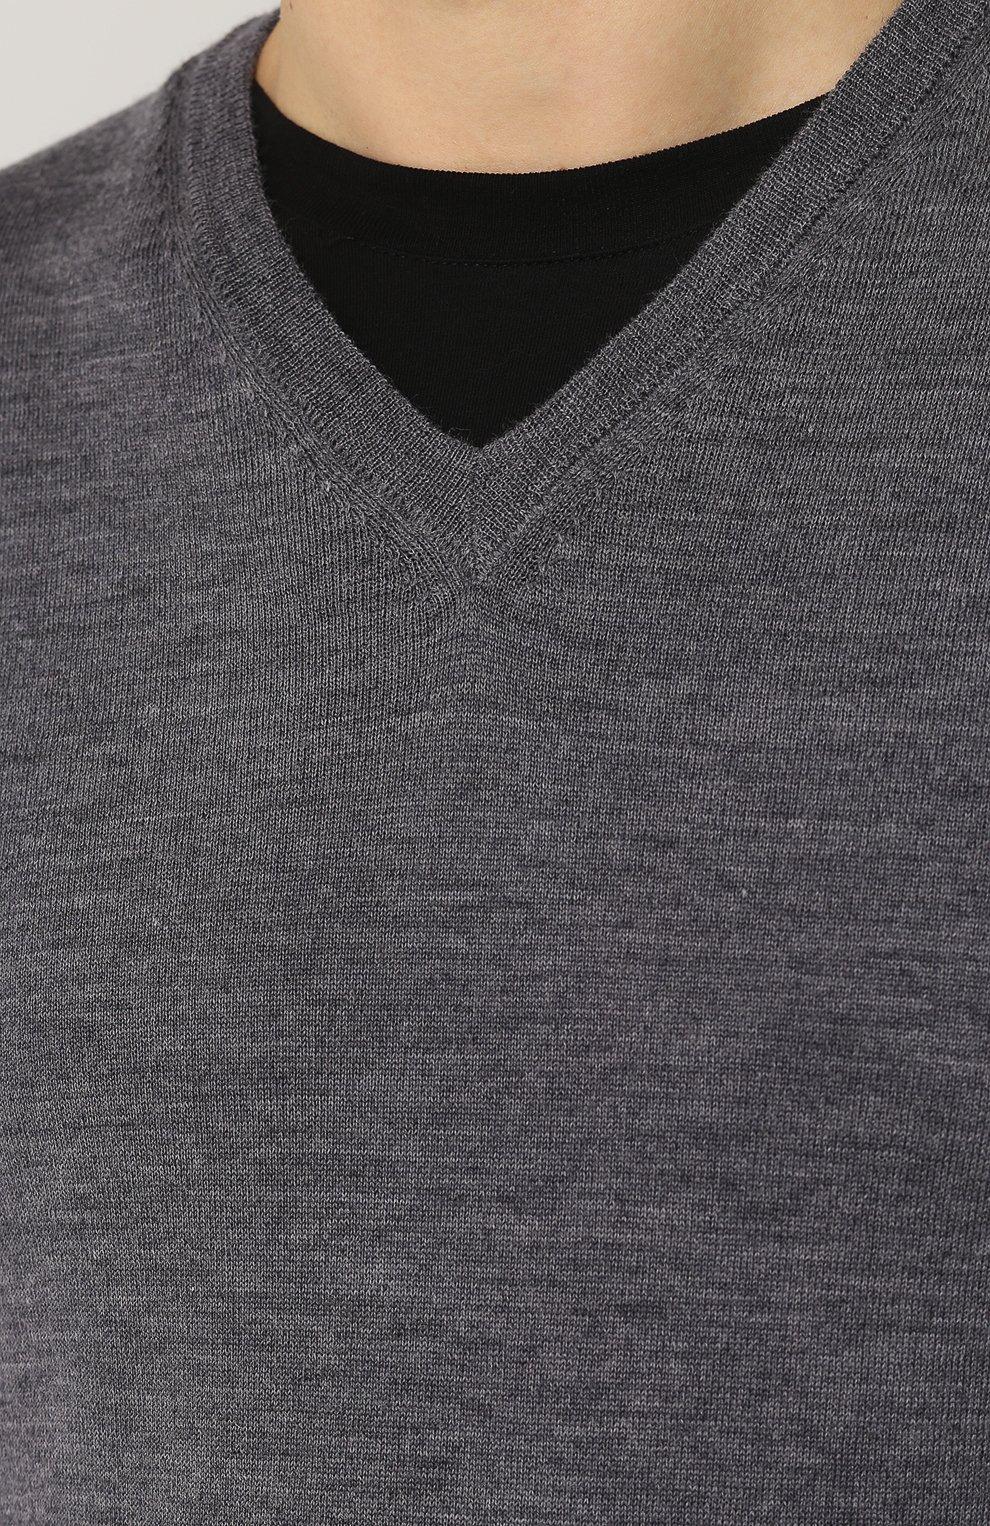 Пуловер из шерсти тонкой вязки   Фото №5